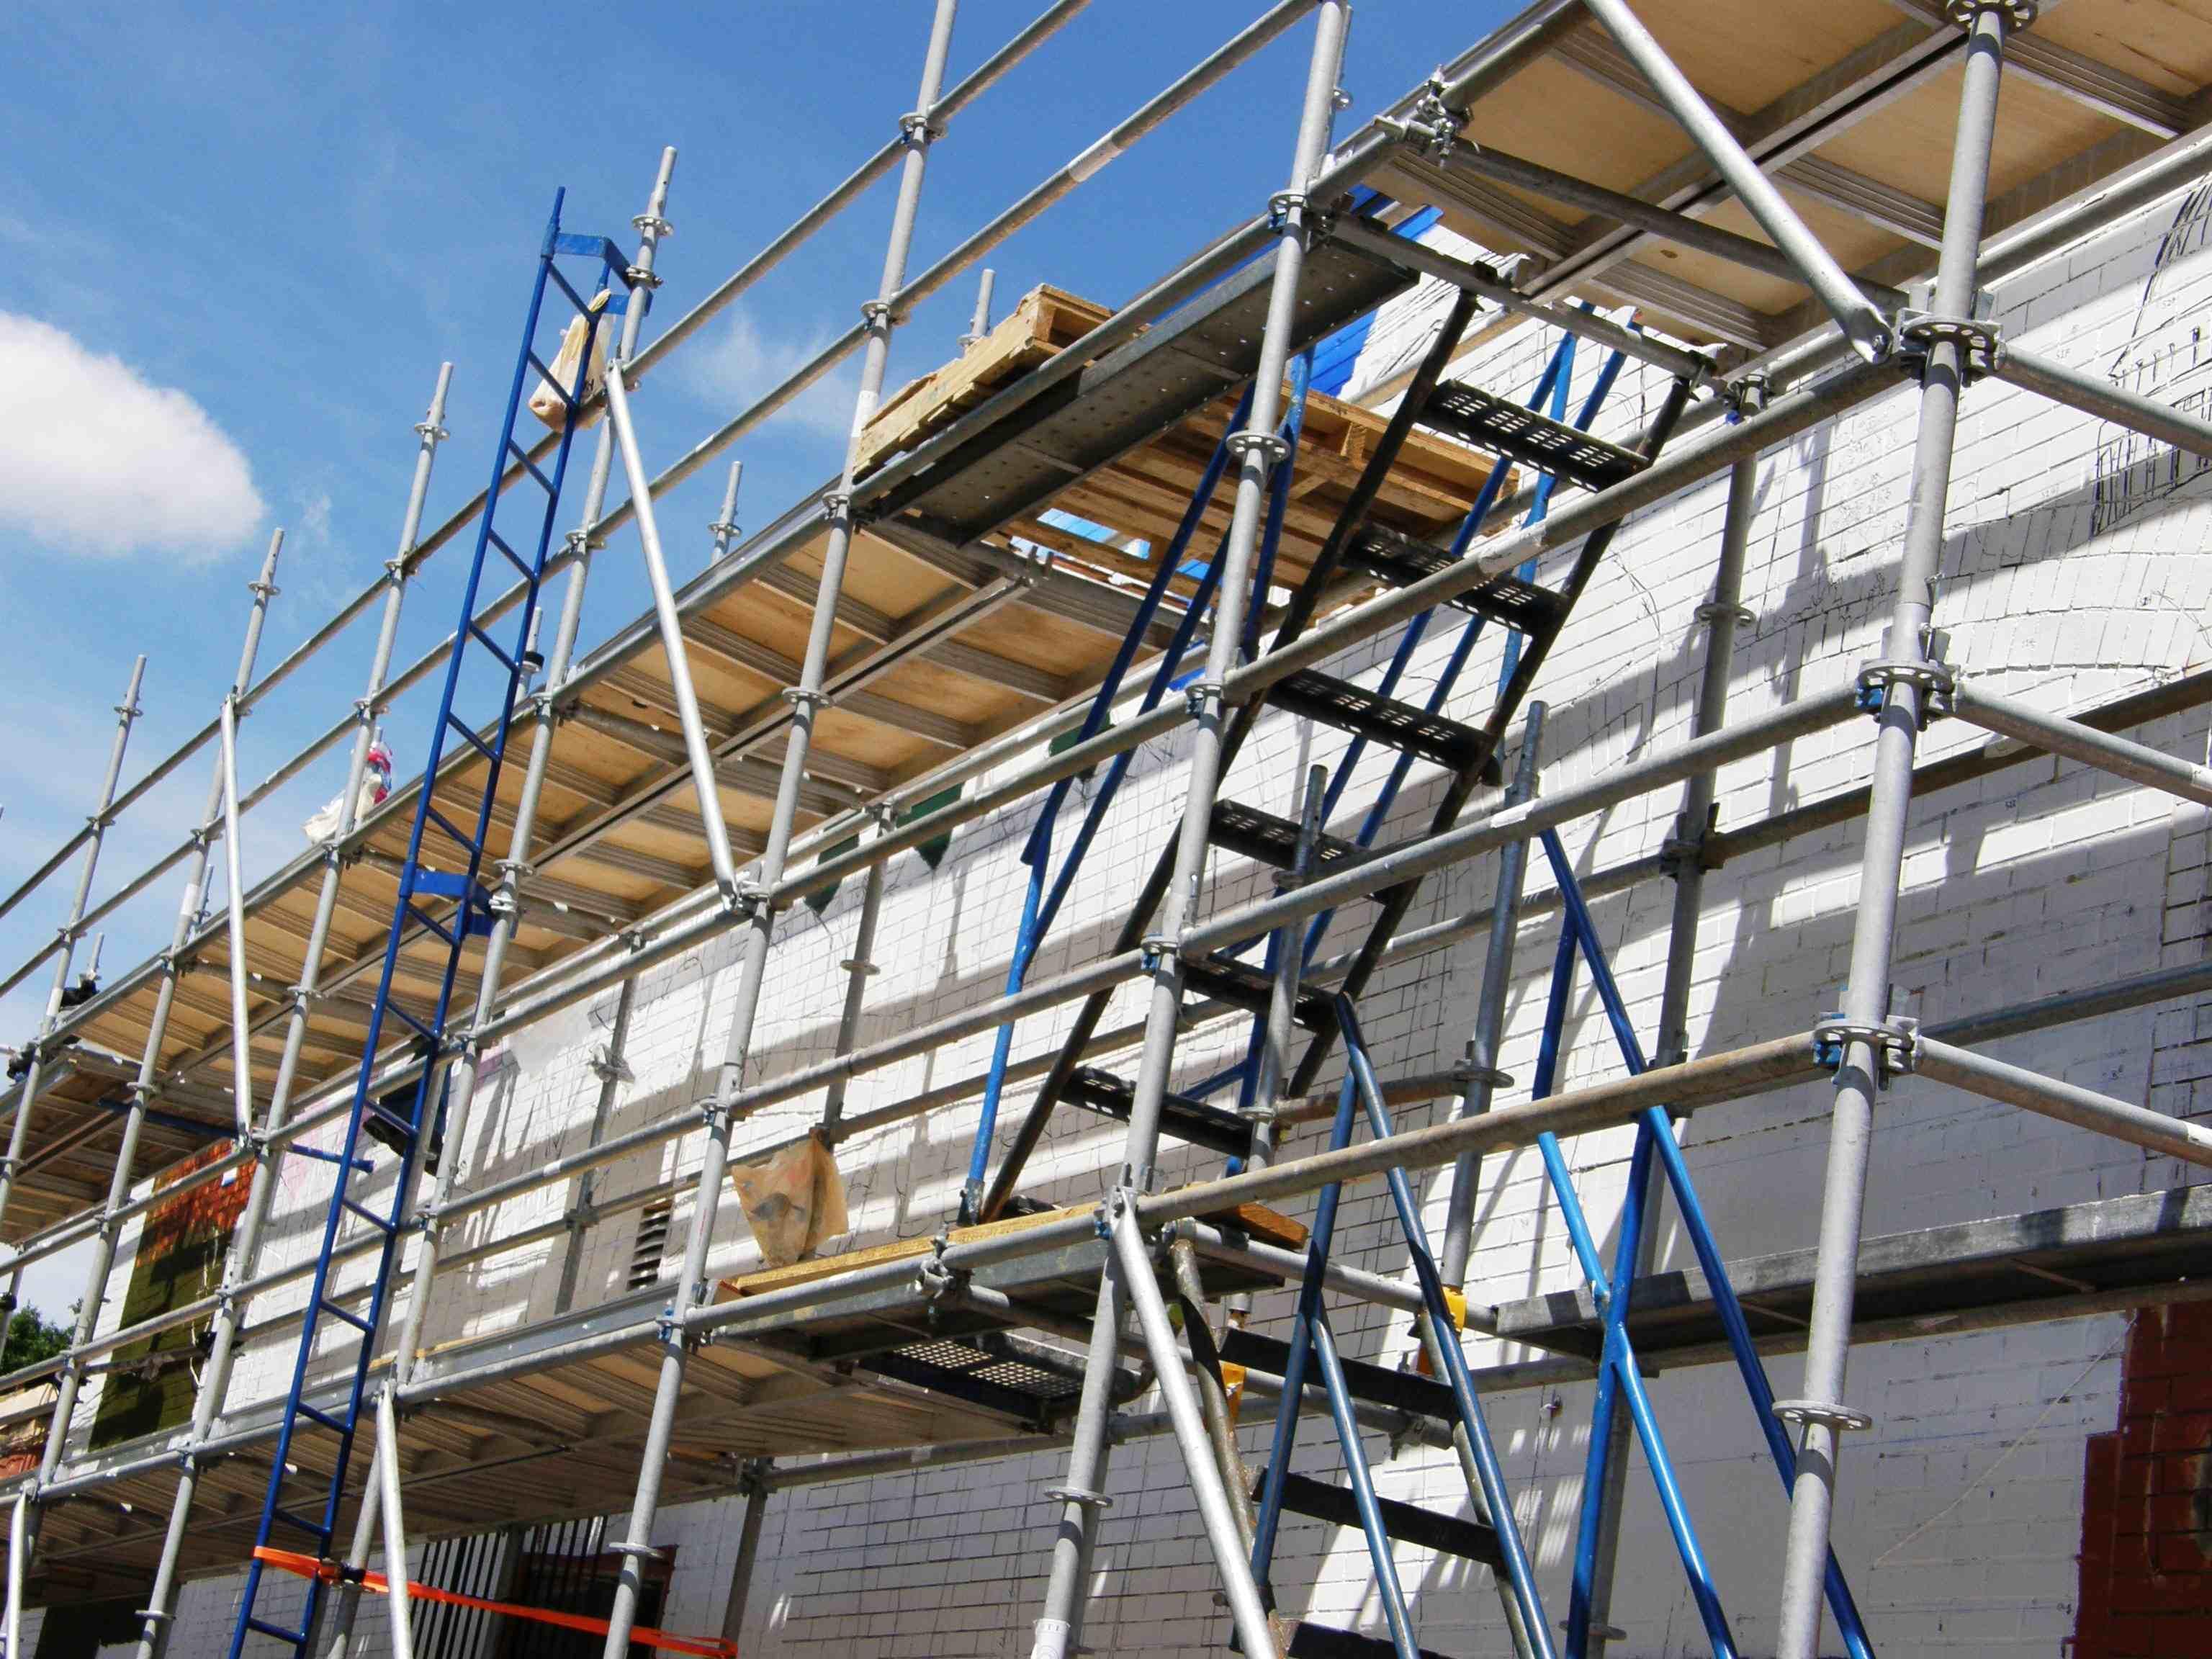 Construction Scaffolding Design : New york construction accident lawyer david perecman